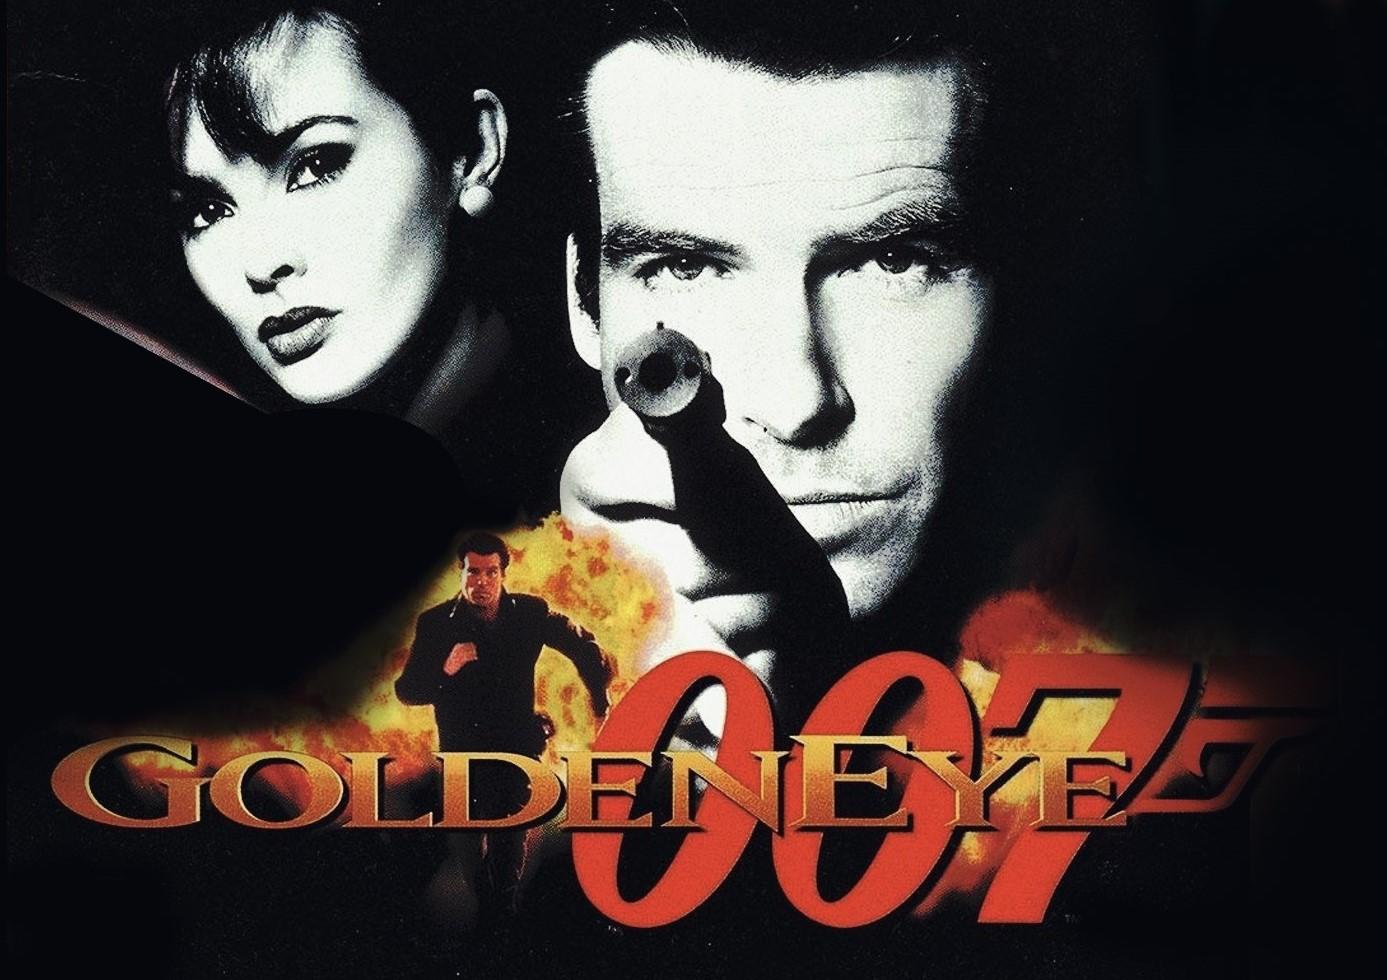 Golden Eye 007 covers